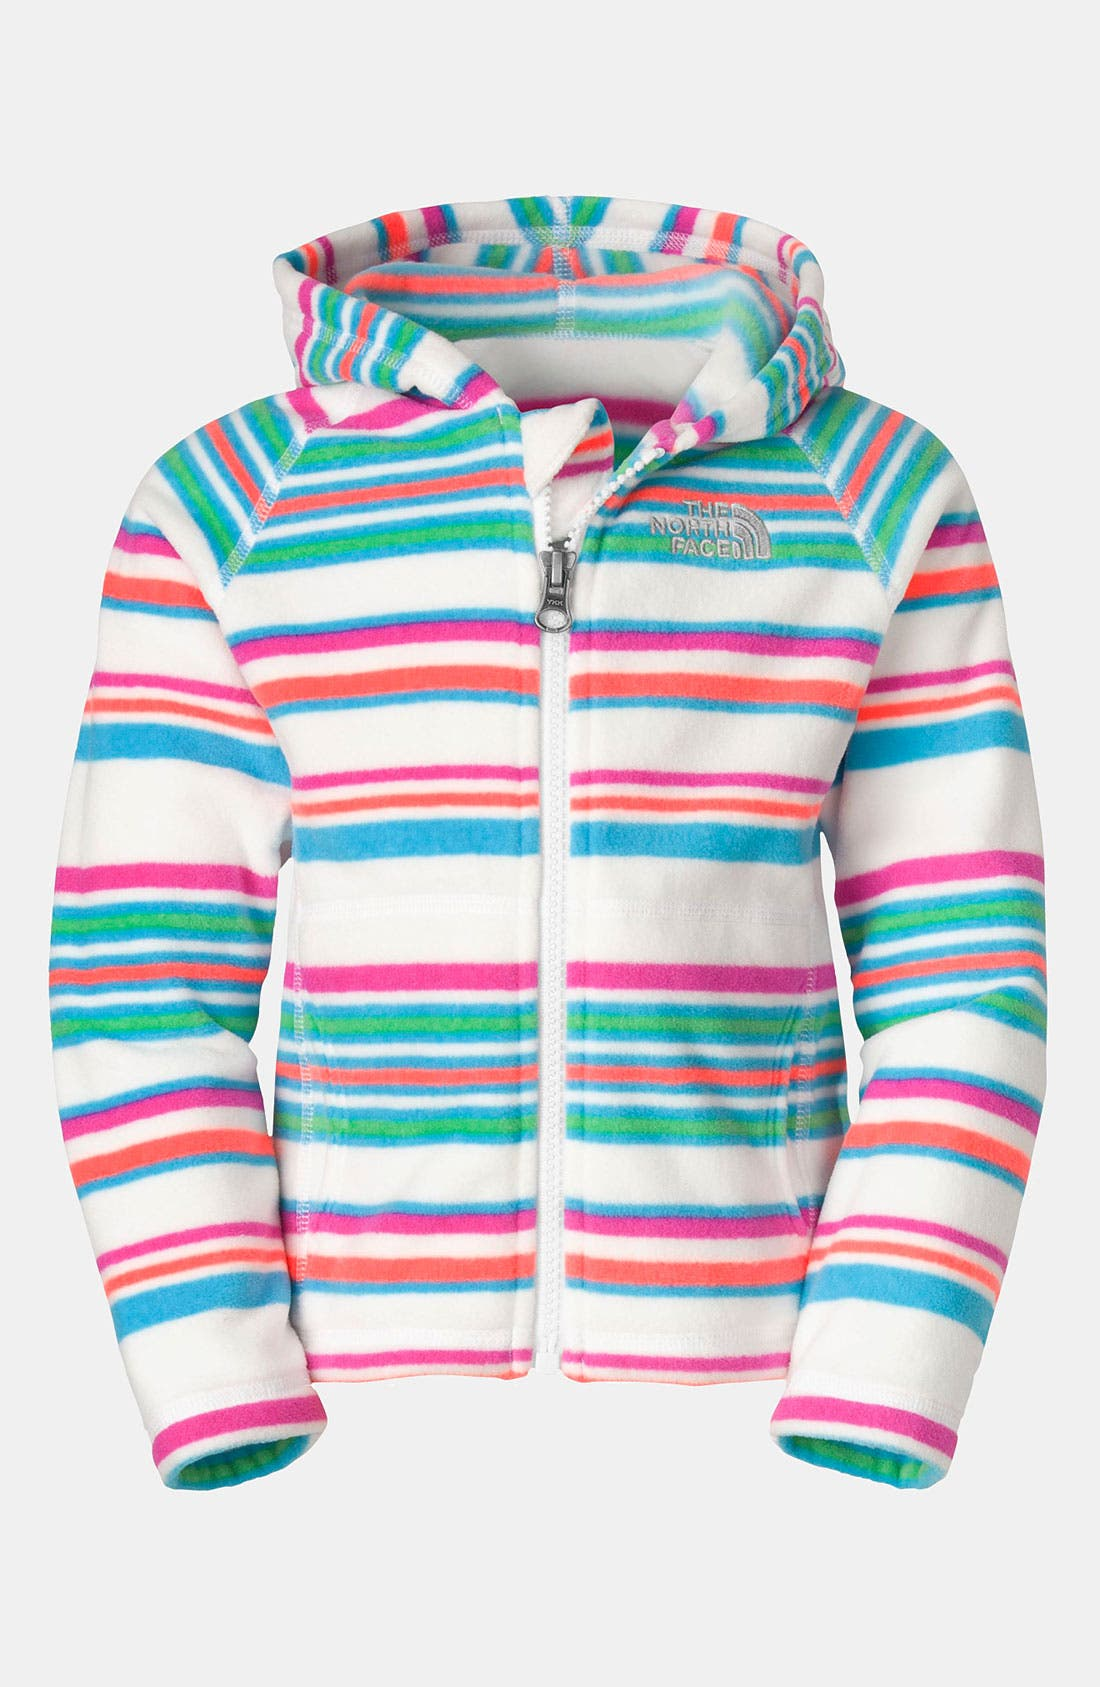 Main Image - The North Face 'Glacier' Fleece Jacket (Toddler)